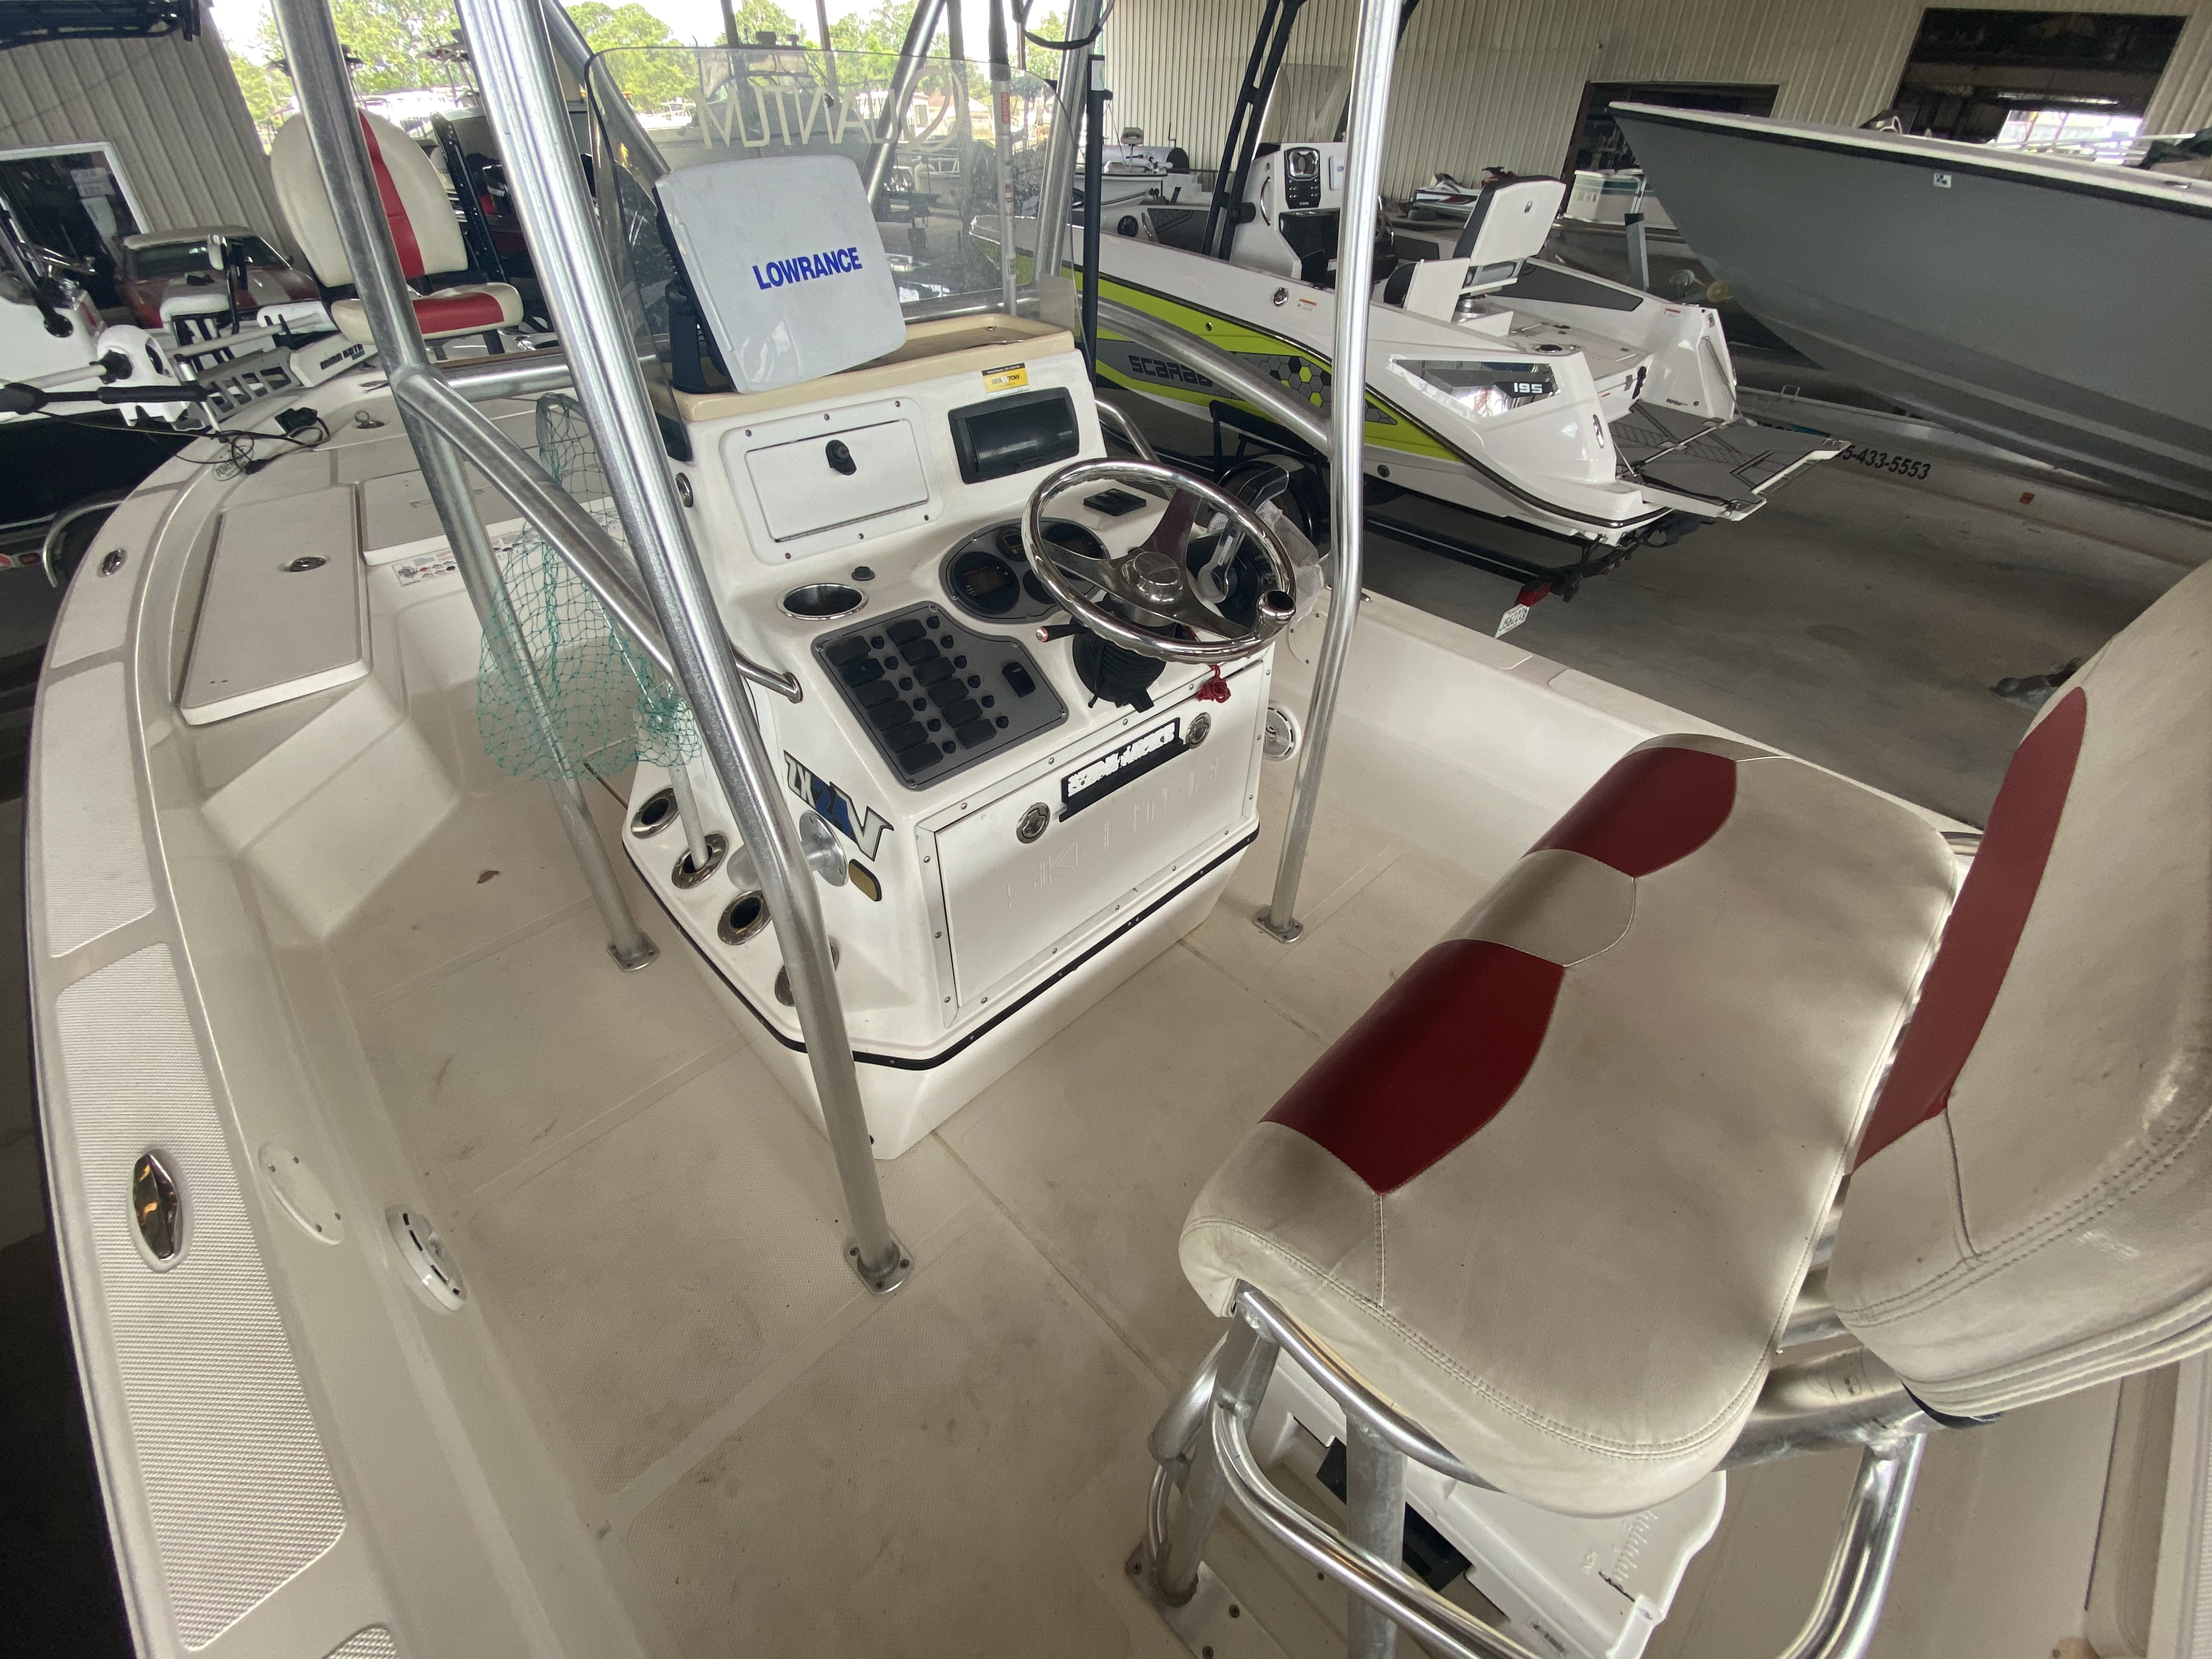 2010 Skeeter boat for sale, model of the boat is ZX24V & Image # 9 of 16